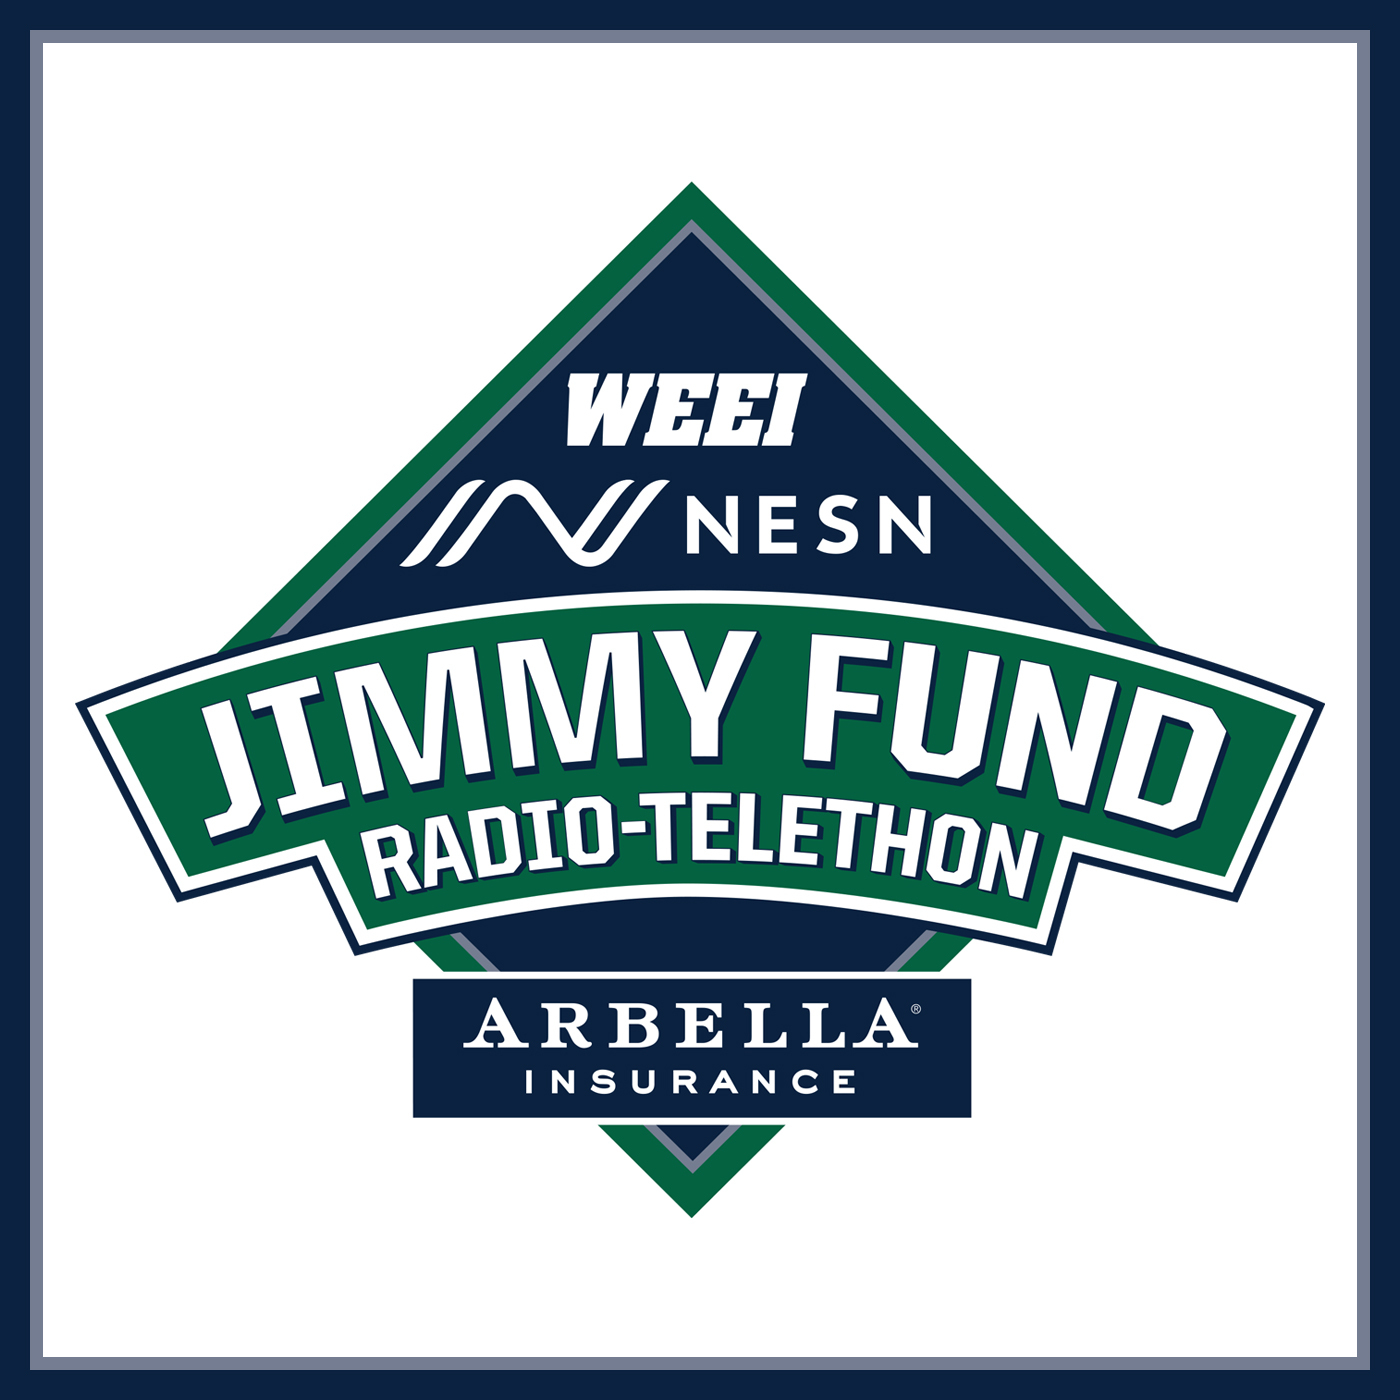 WEEI/NESN Jimmy Fund Radio-Telethon